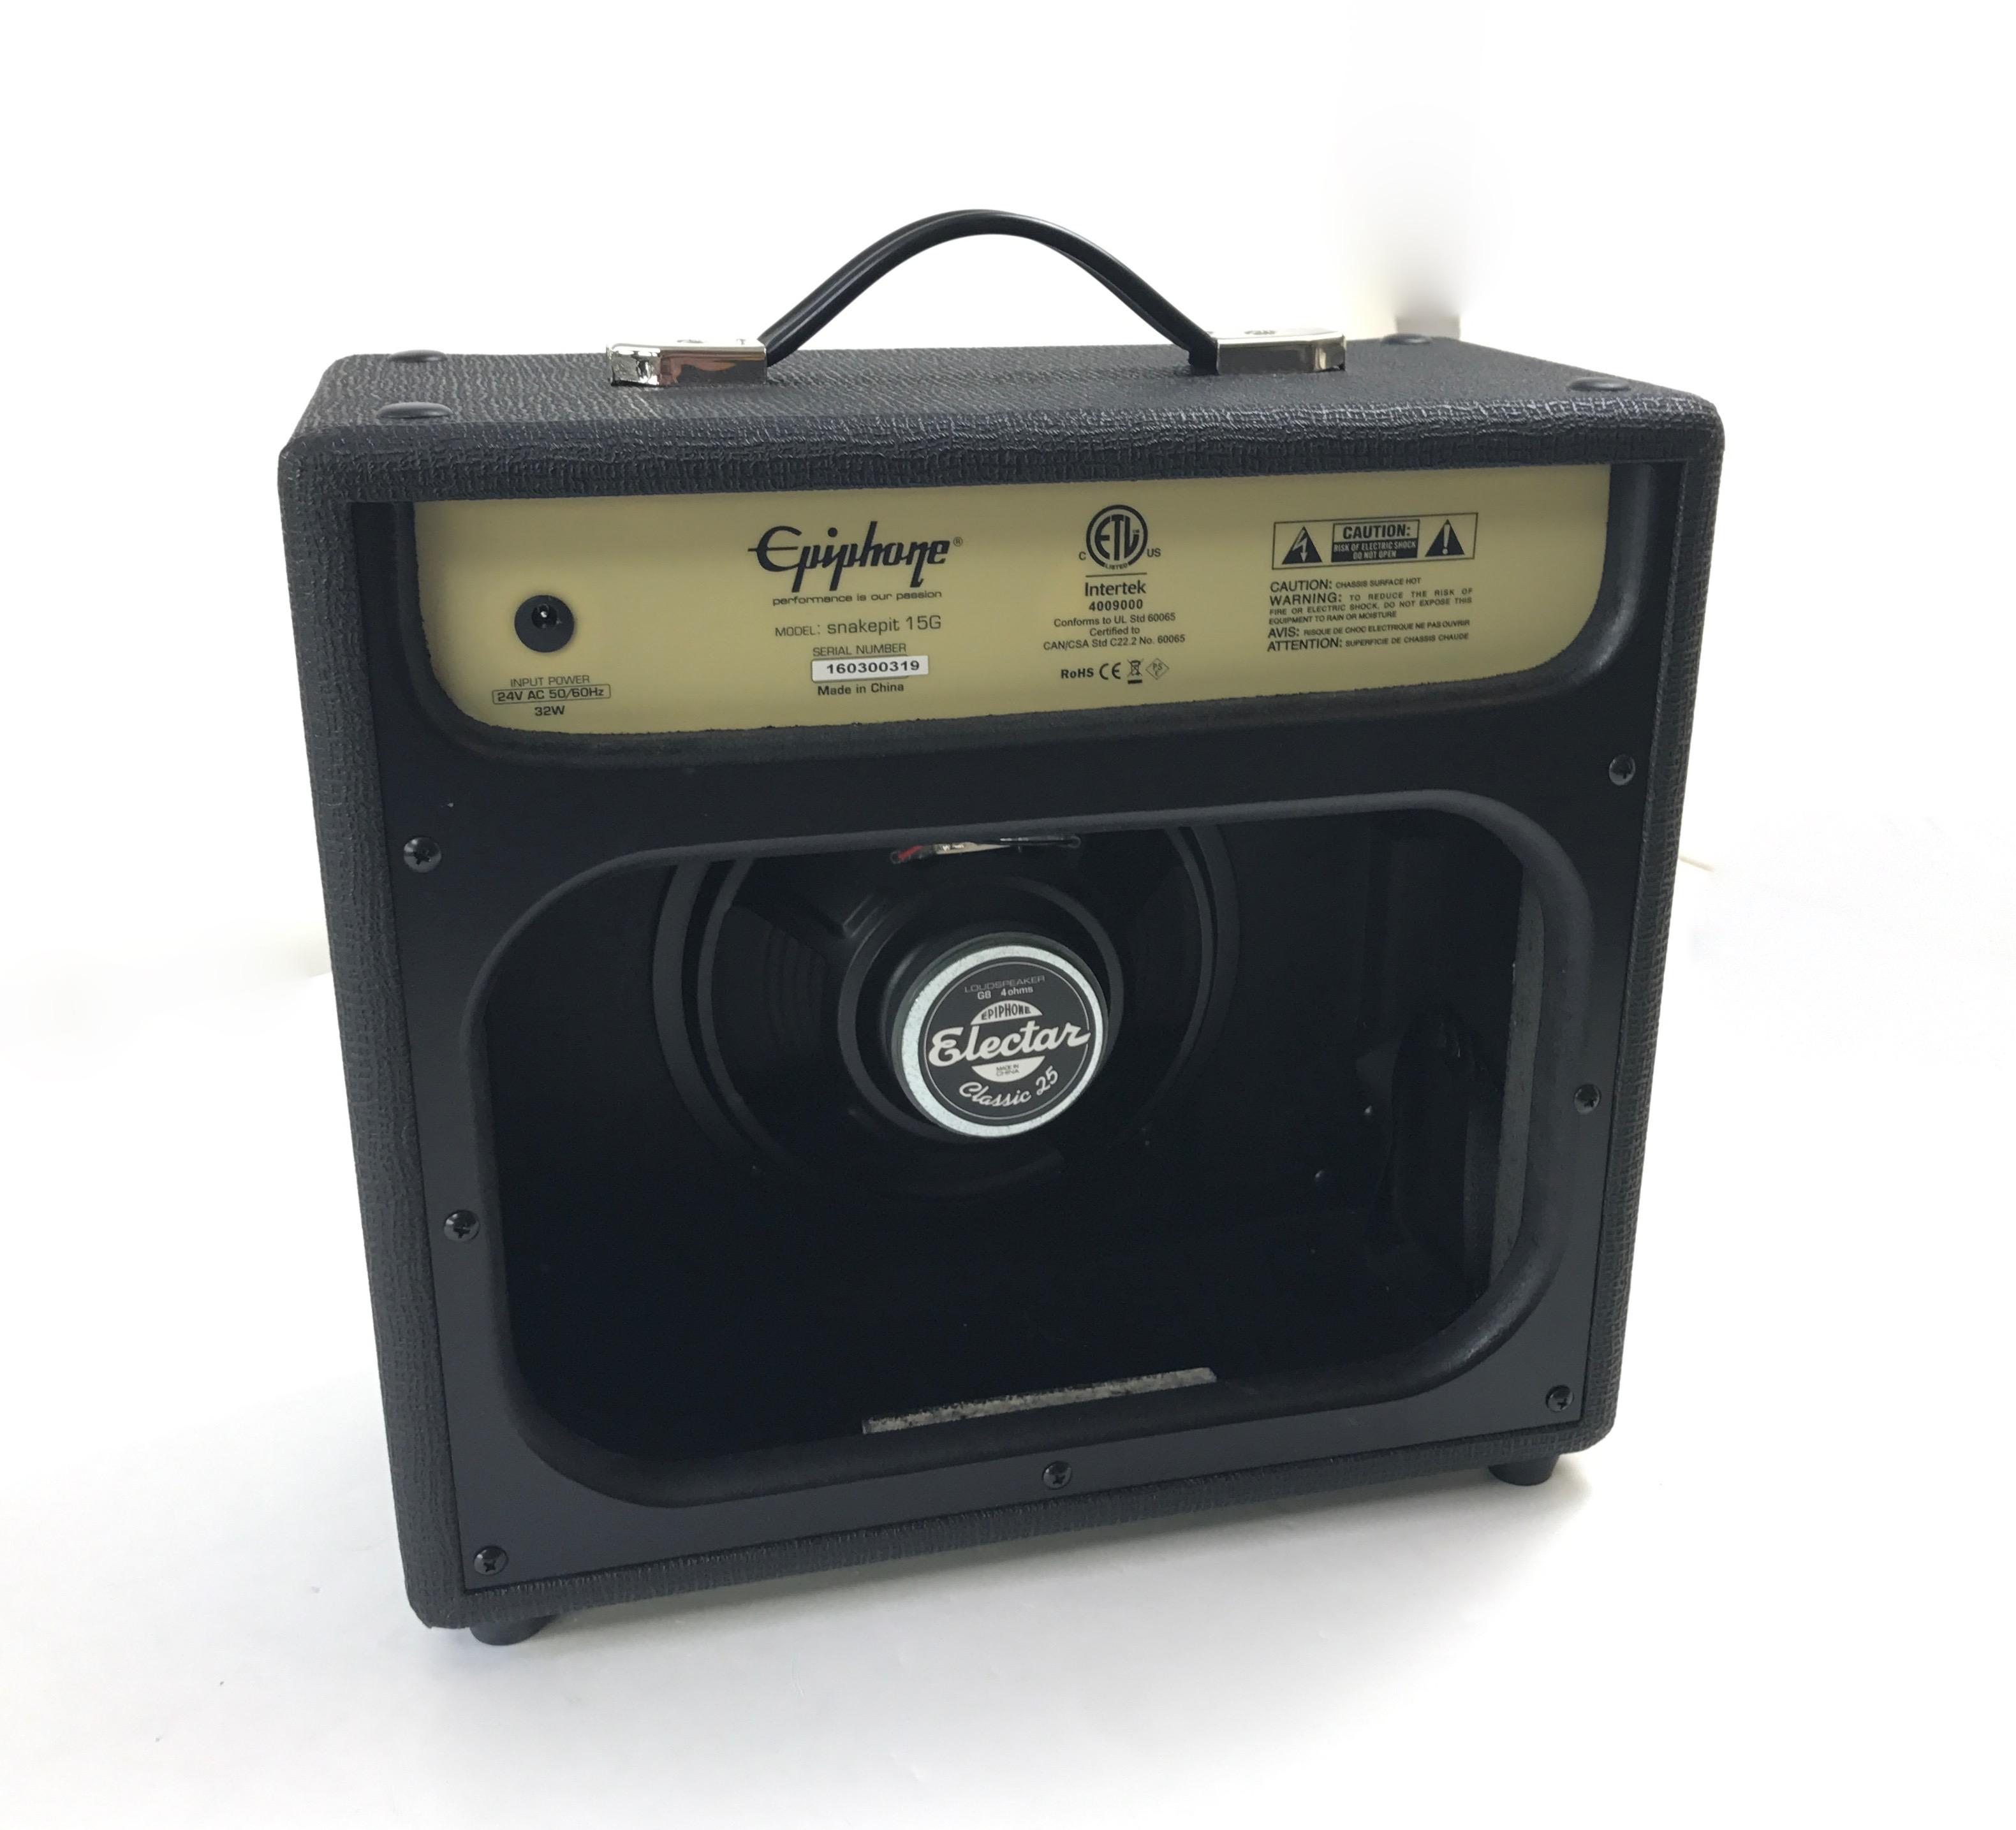 epiphone slash afd les paul performance pack image 1695222 audiofanzine. Black Bedroom Furniture Sets. Home Design Ideas